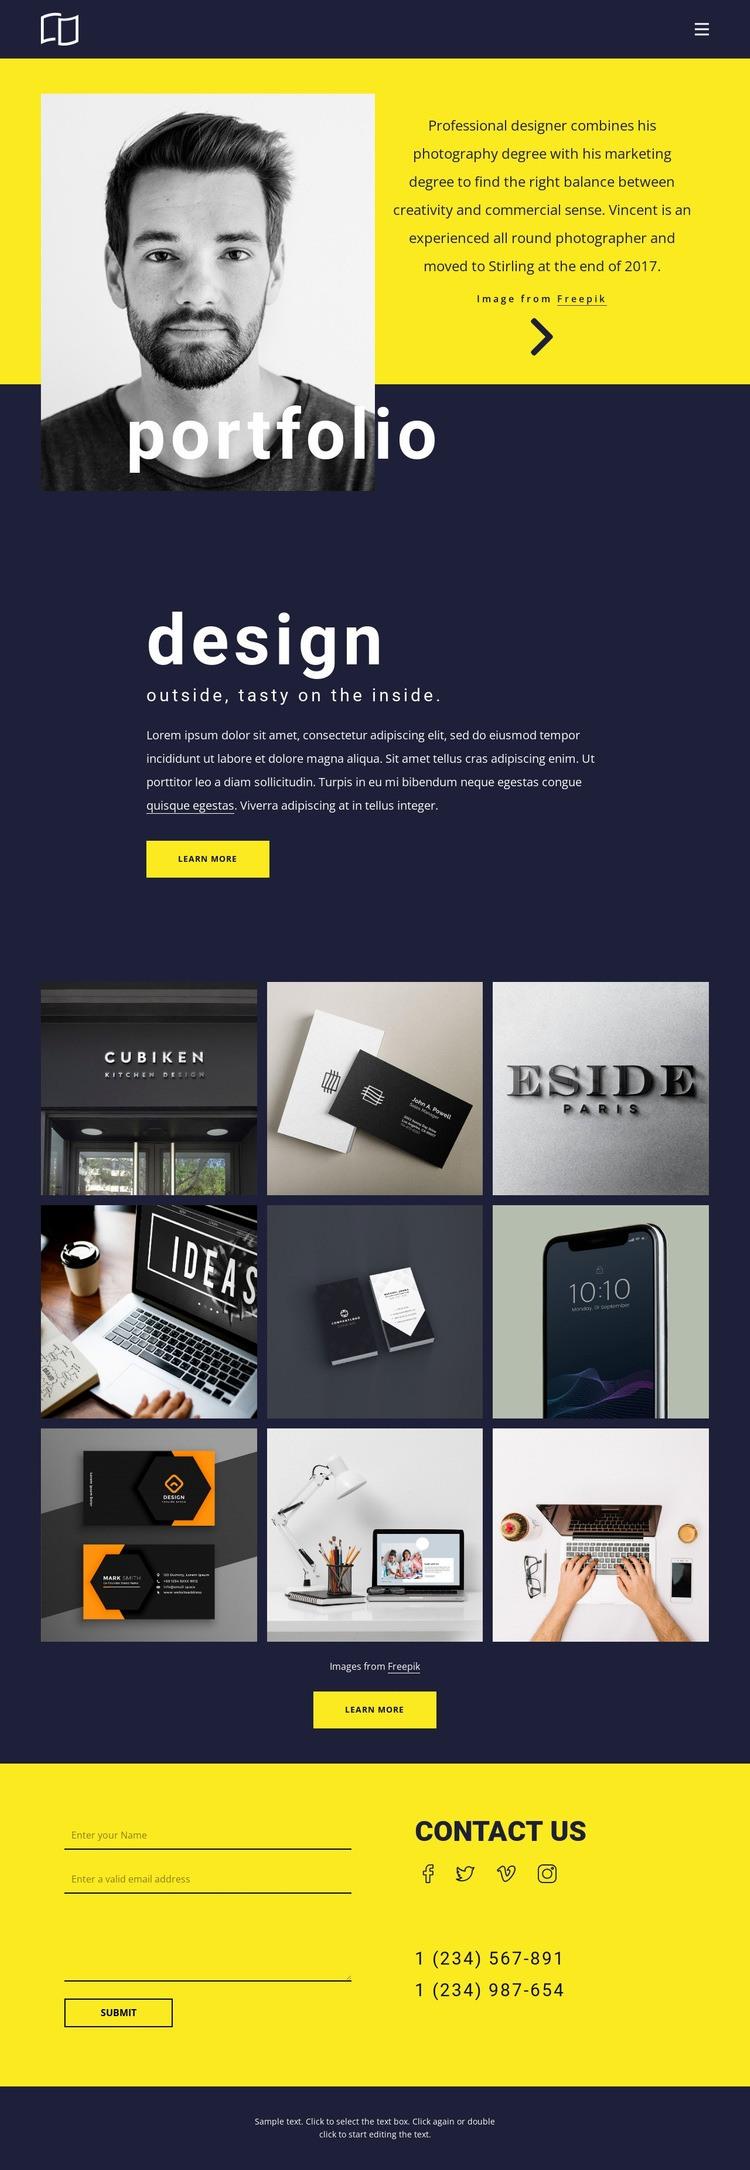 Amazing portfolio Web Page Design